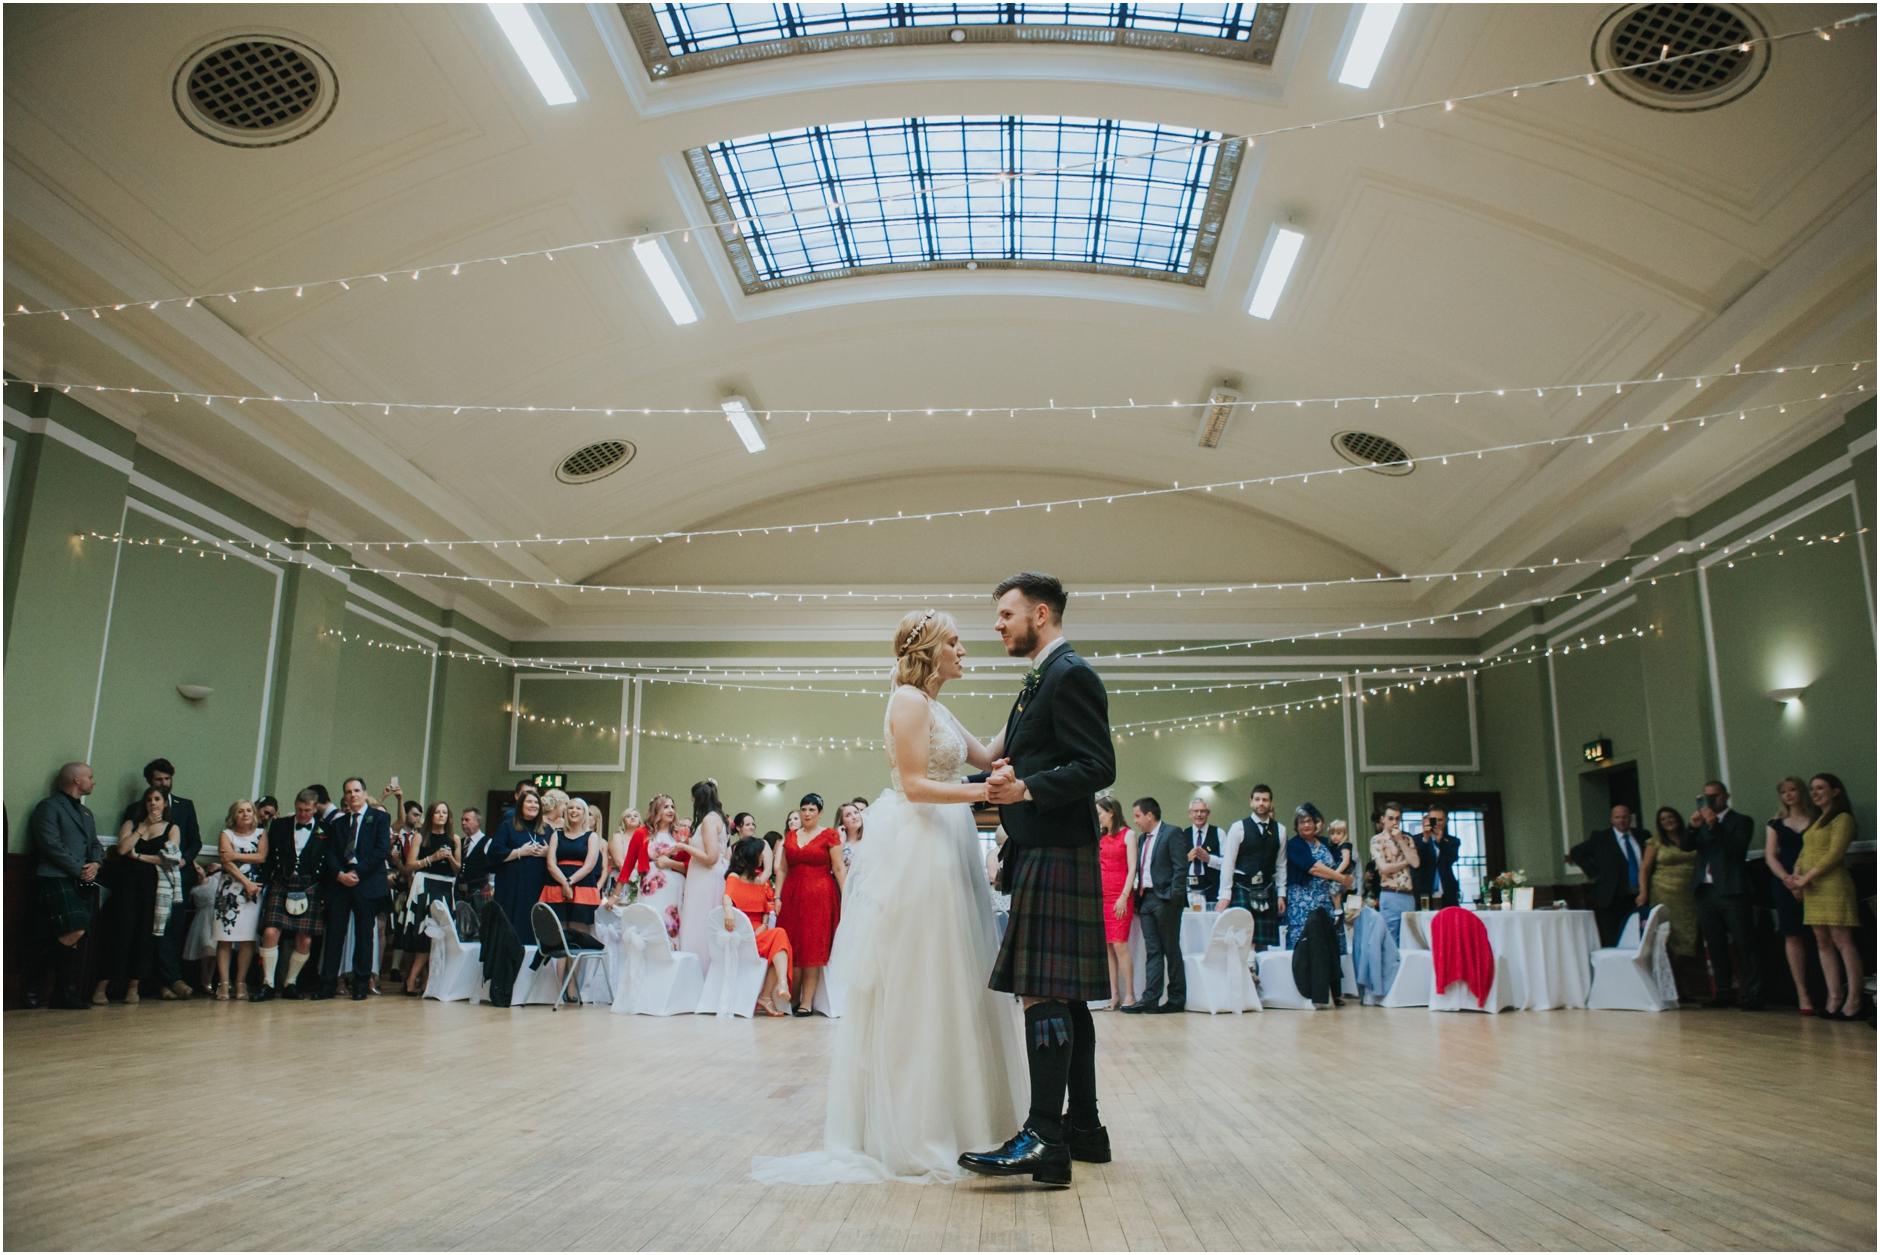 couple first dance wedding thomas morton hall edinburgh